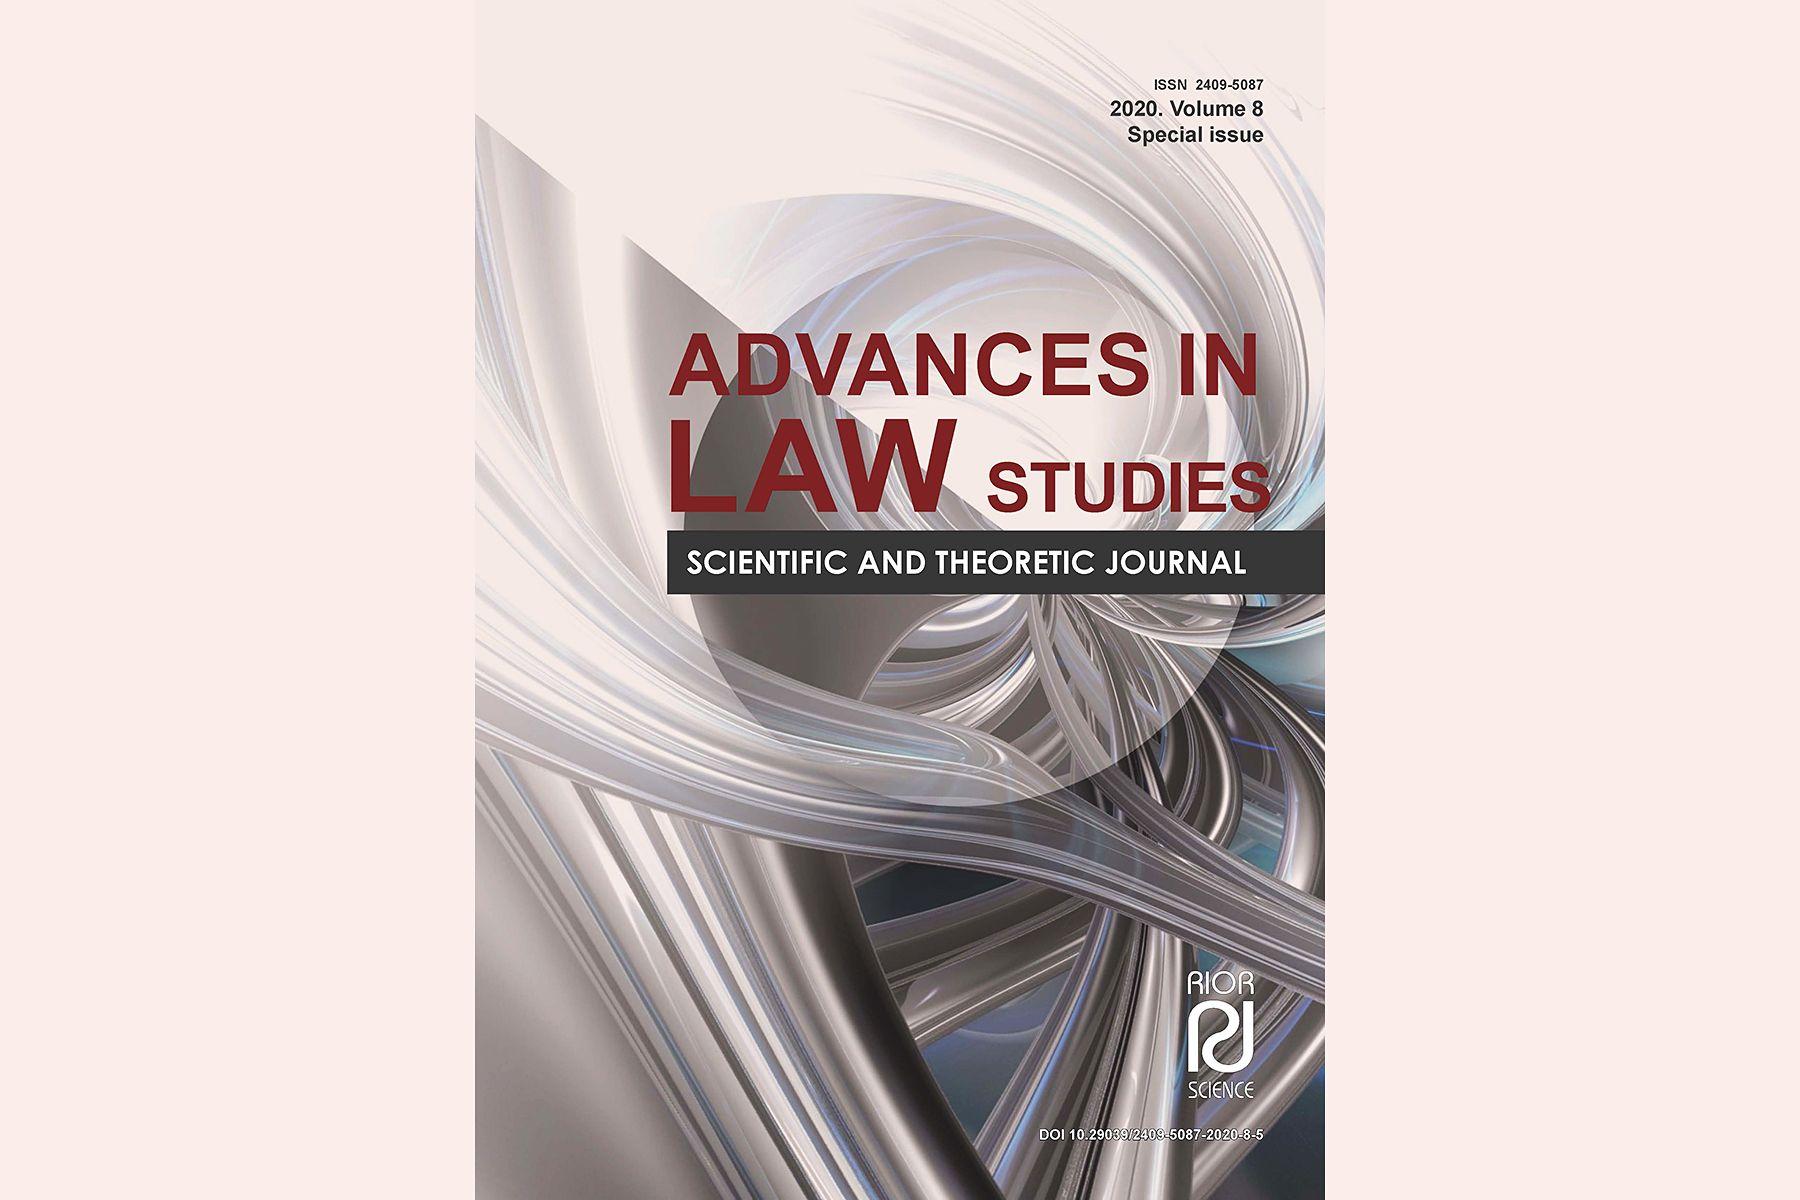 Научная школа профессора ВГУЭС Алексея Мамычева представлена в научном журнале Advances in Law Studies